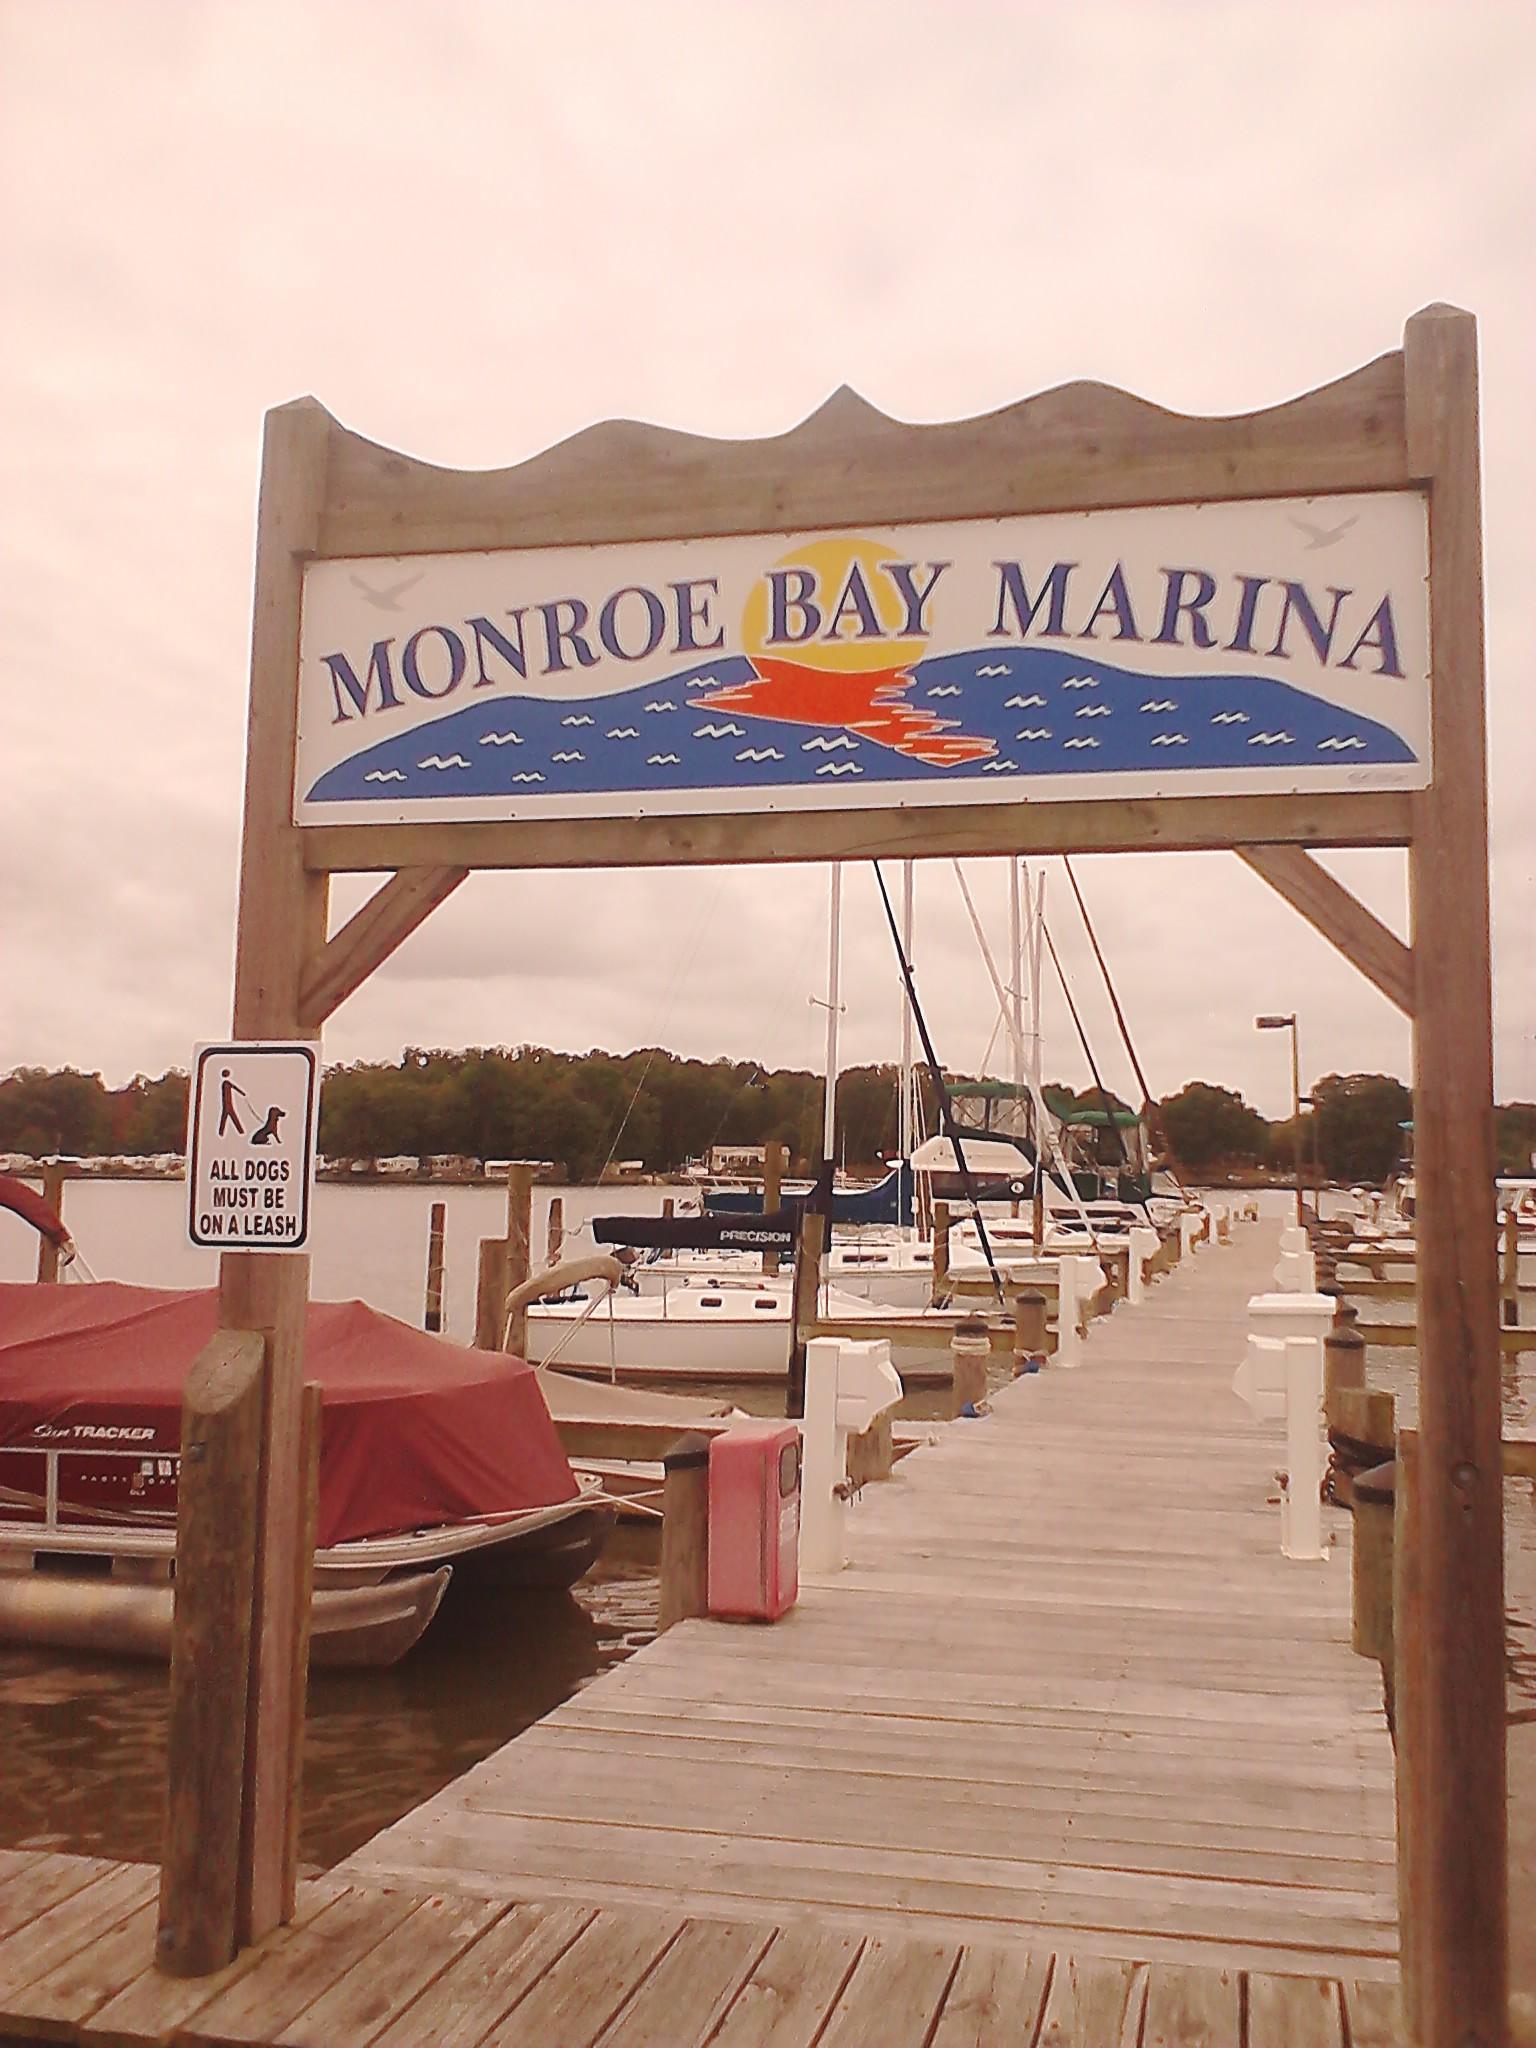 Monroe Bay Marina